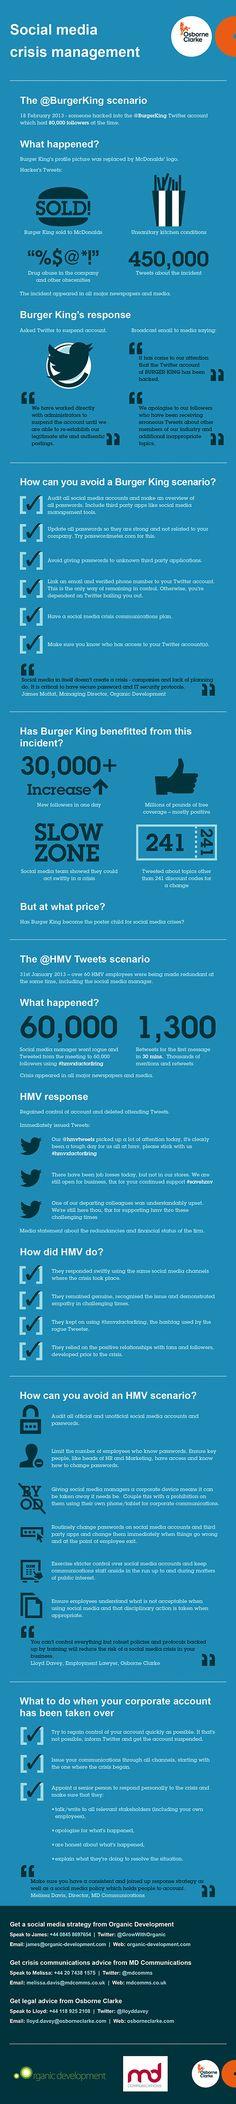 Good Infographic on Preventing a Social Media Crisis localbizconnect.com | #mobilewebsite